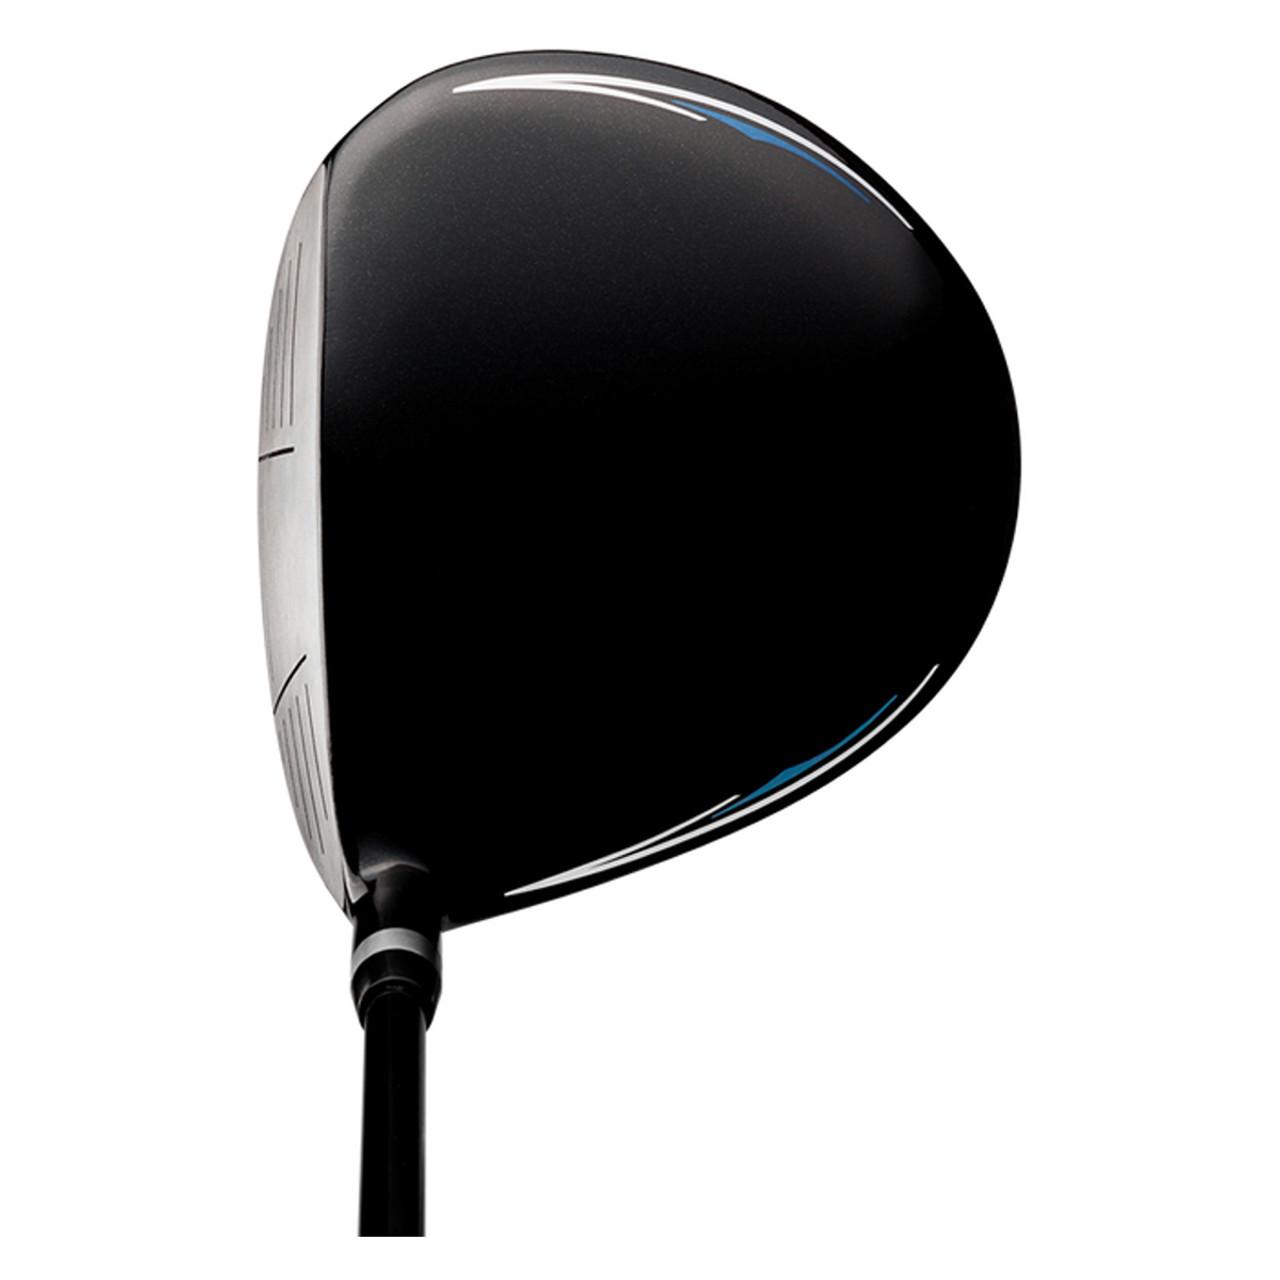 Callaway Strata Ultimate 16 Piece Mens Golf Driver - Address View